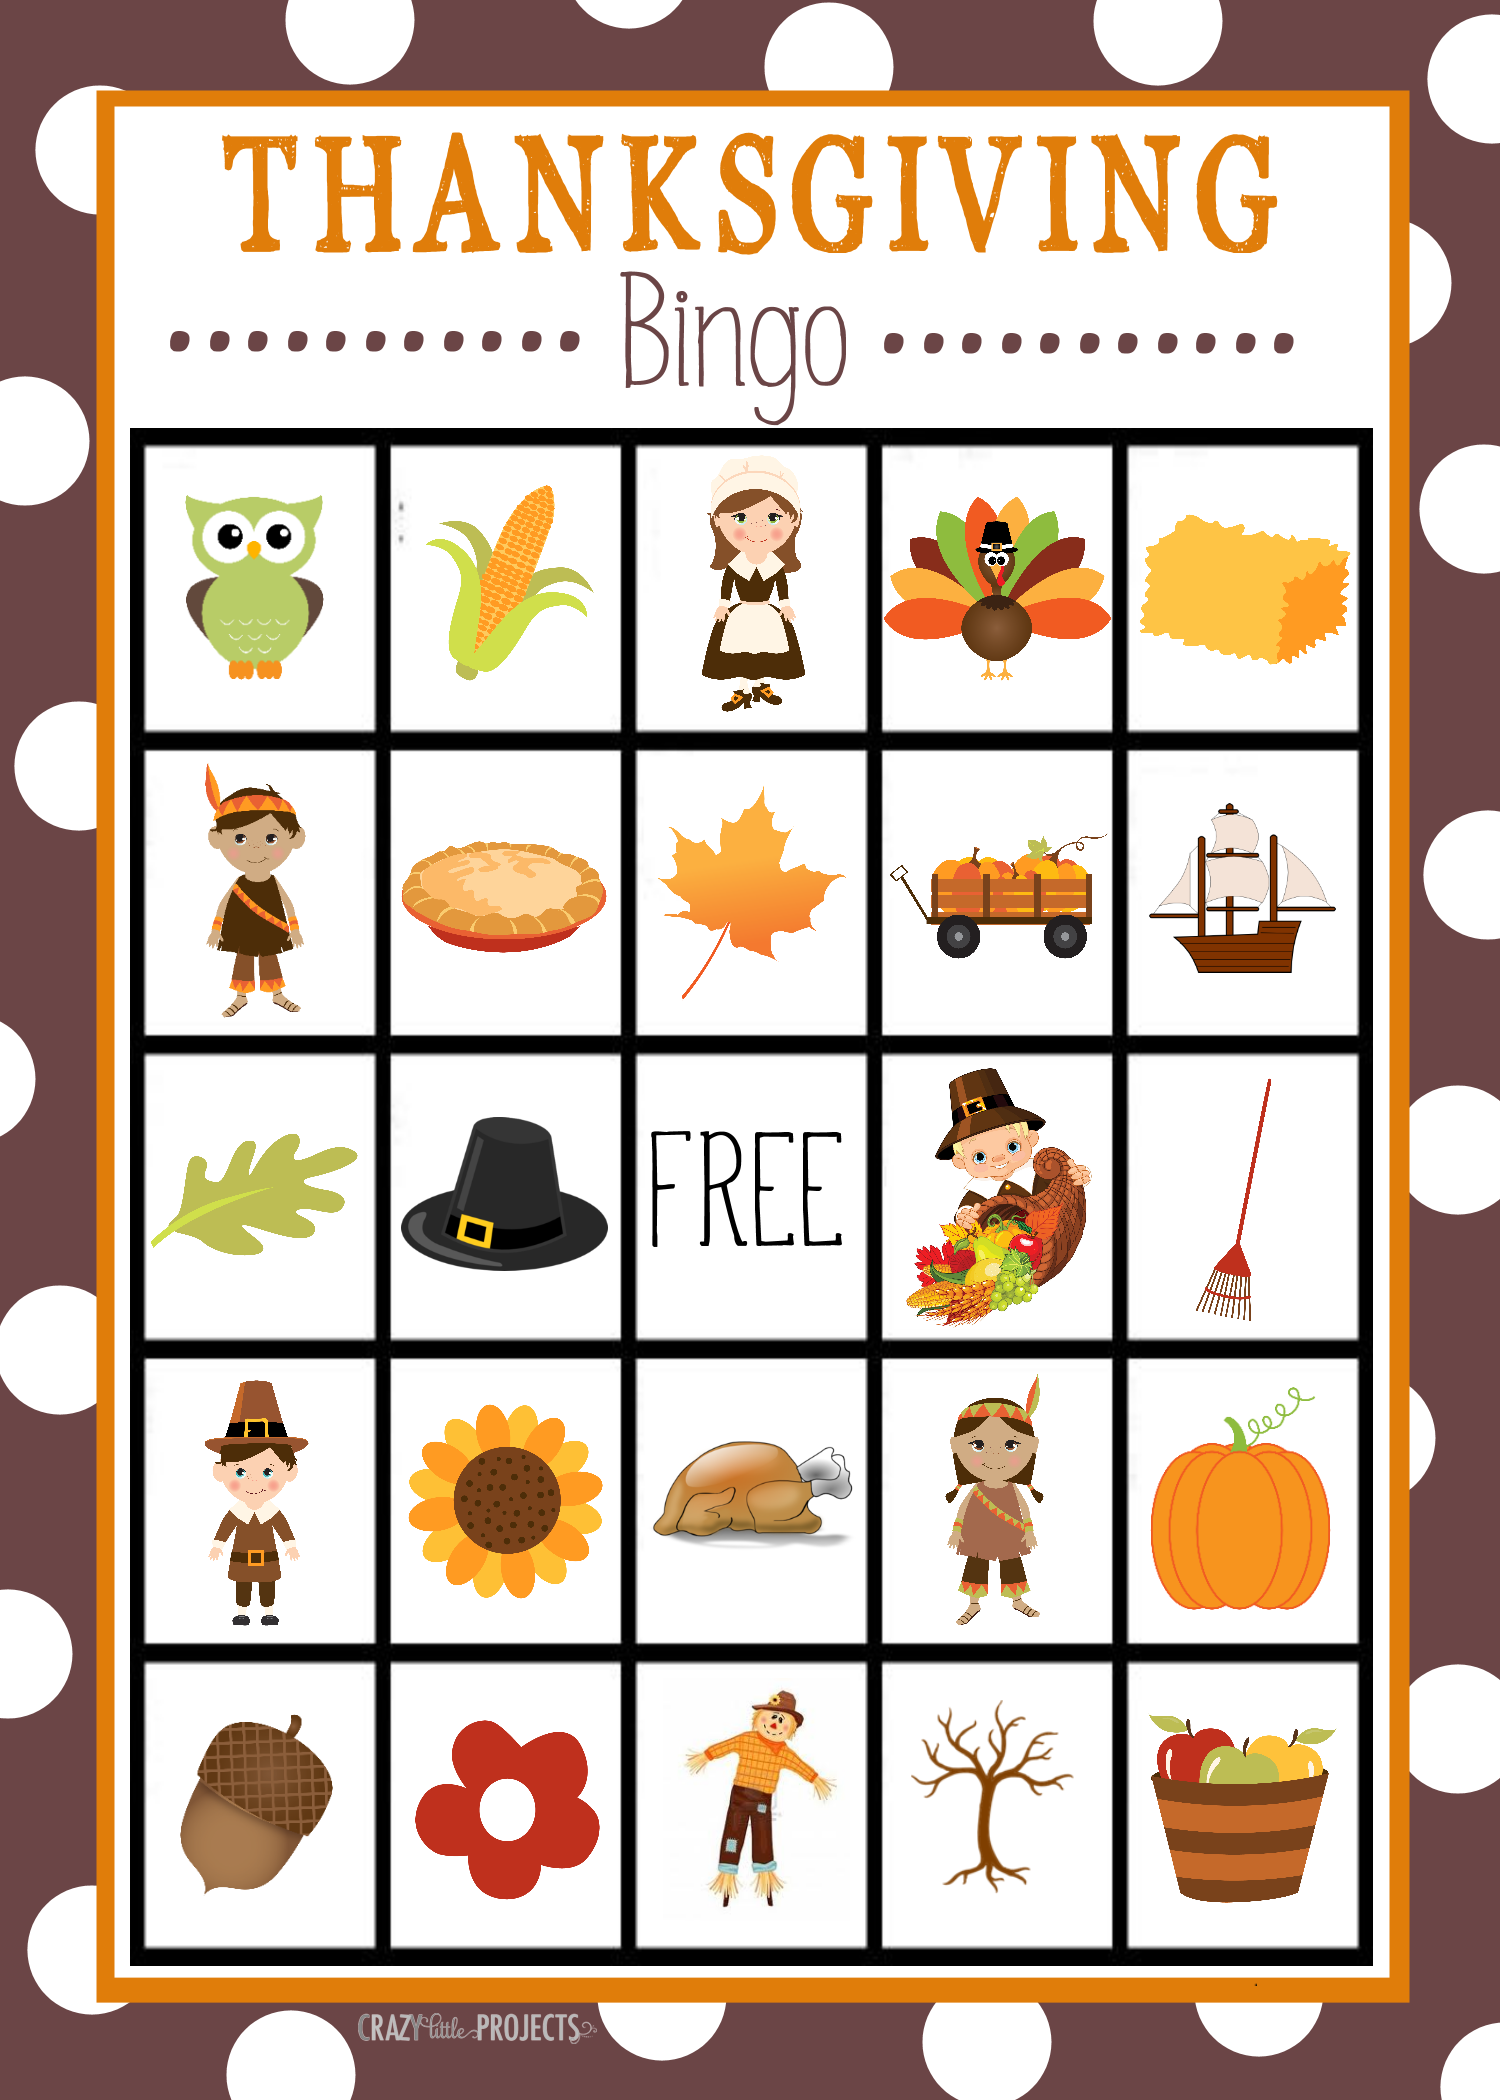 9 Images of Jumbo Printable Thanksgiving Bingo Cards